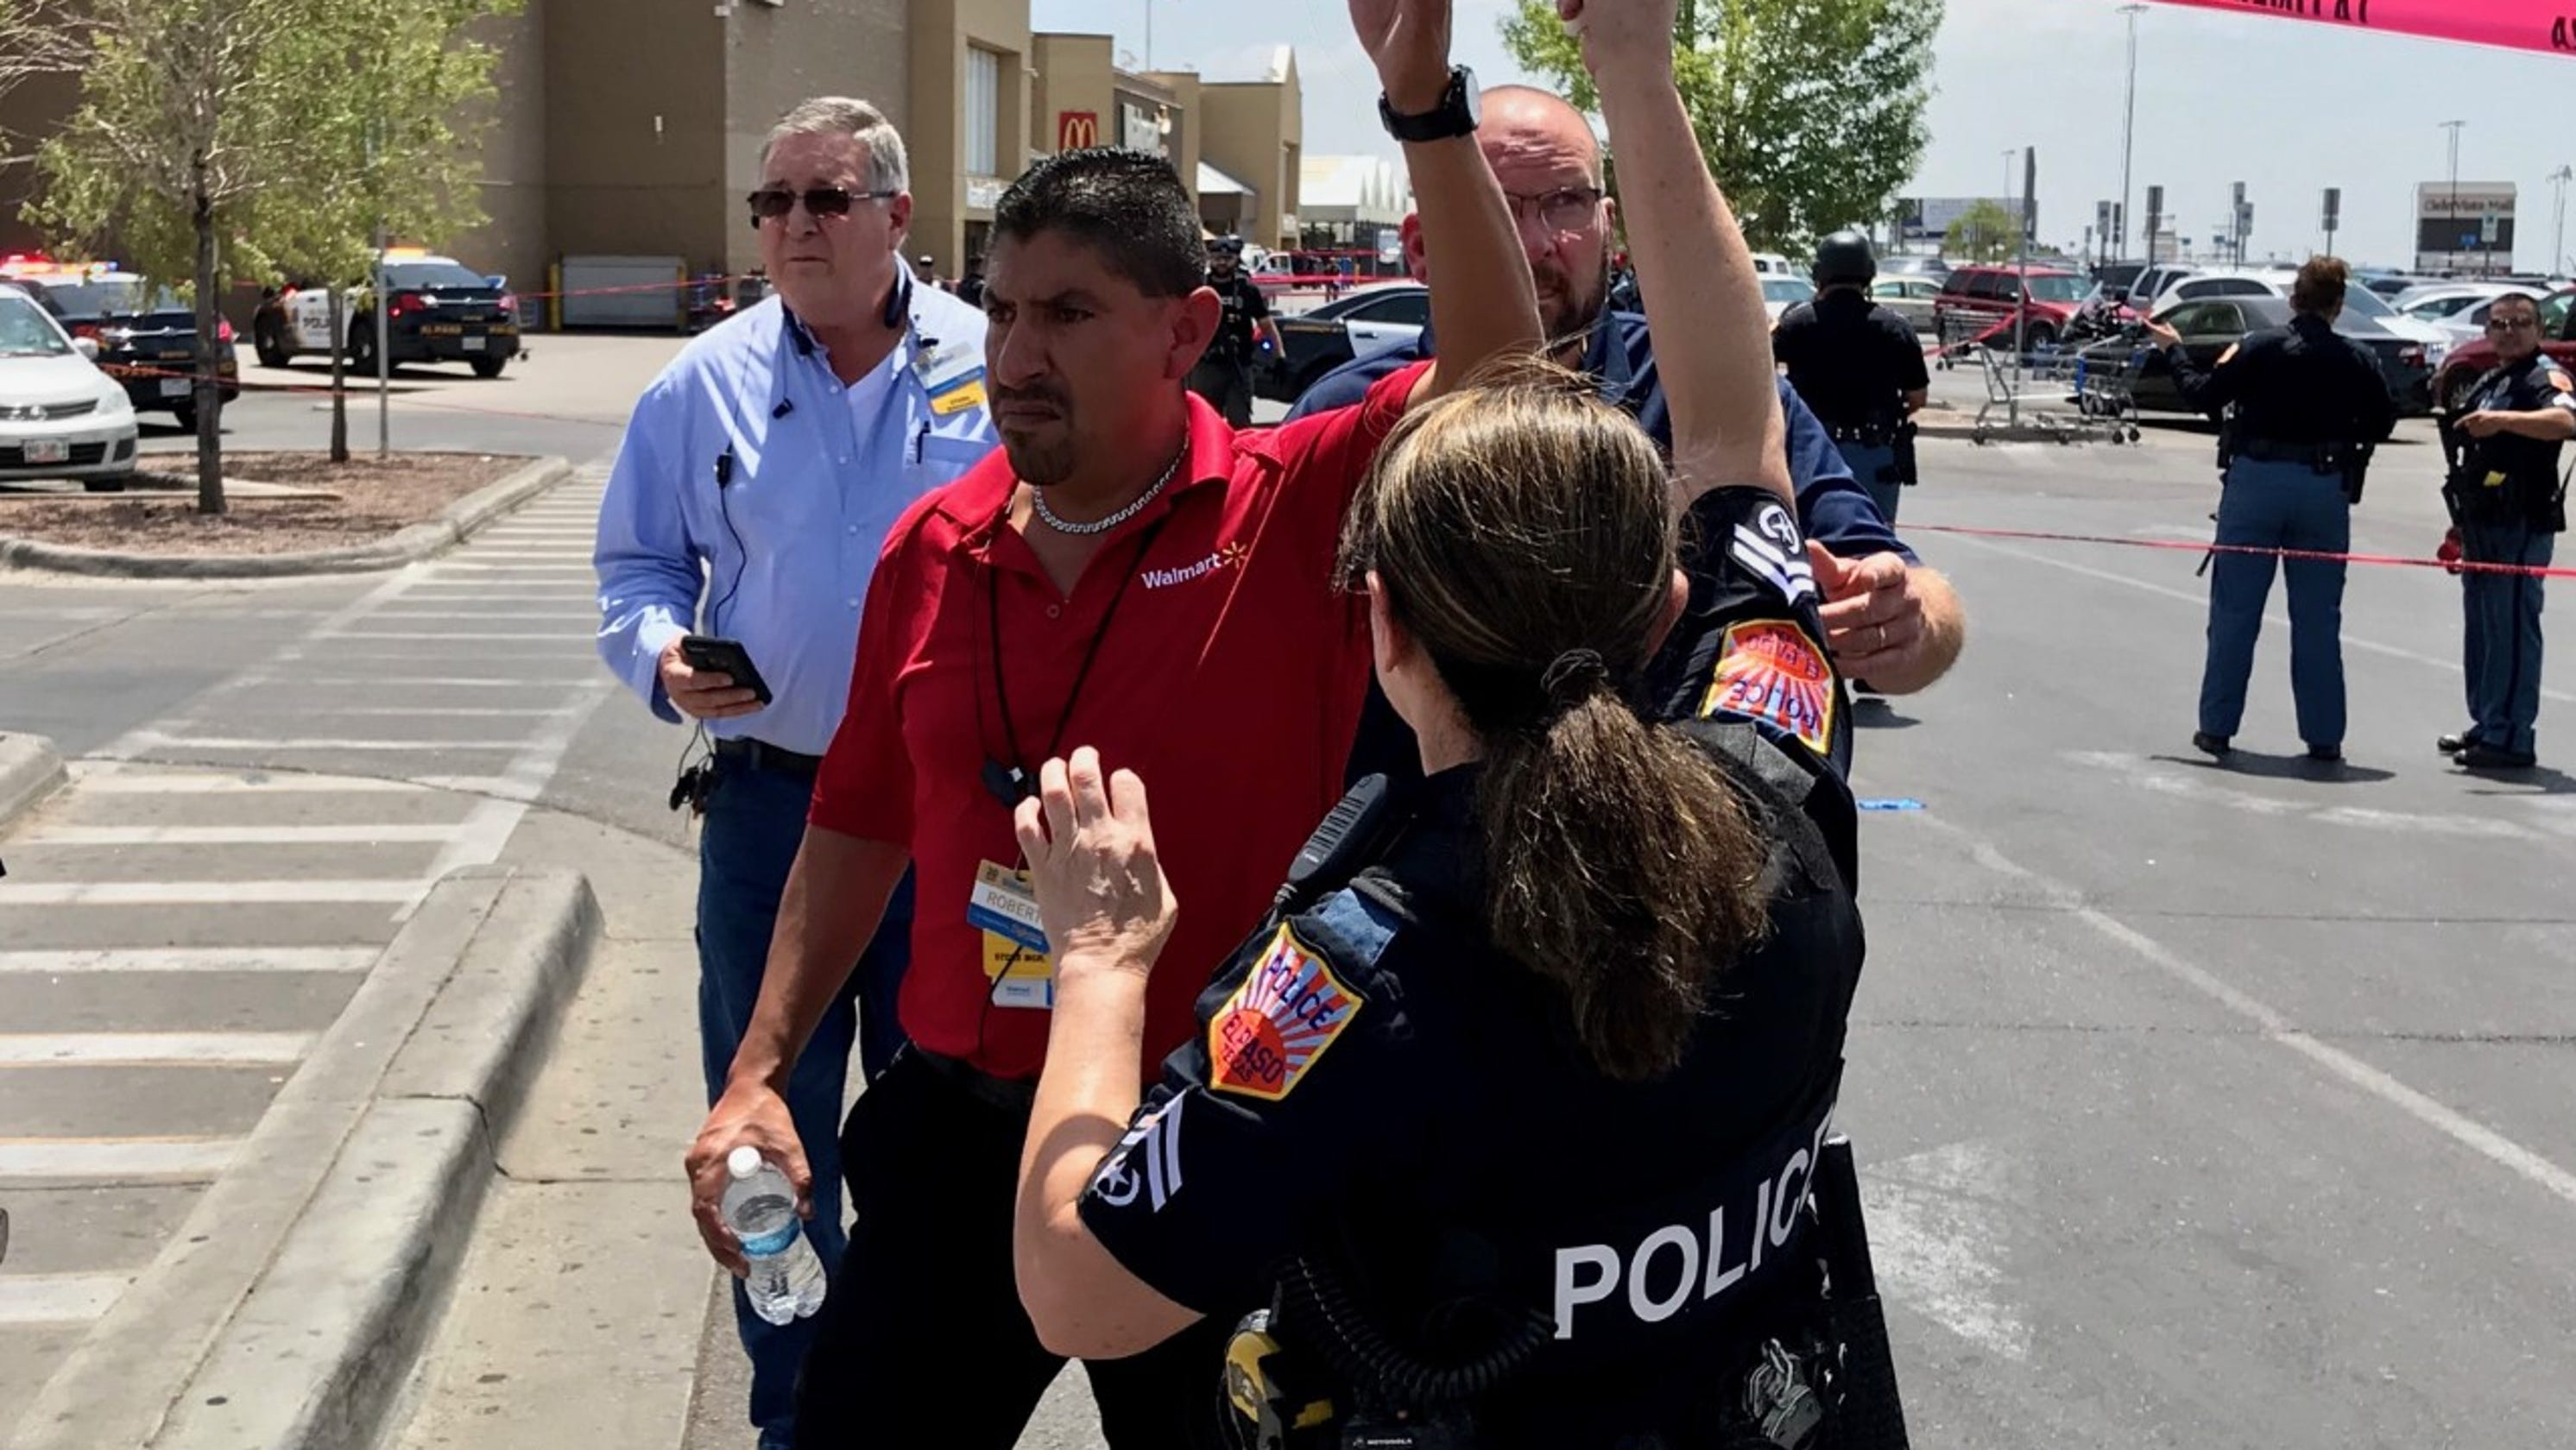 El Paso shooting: Patrick Crusius suspected of killing 20 at